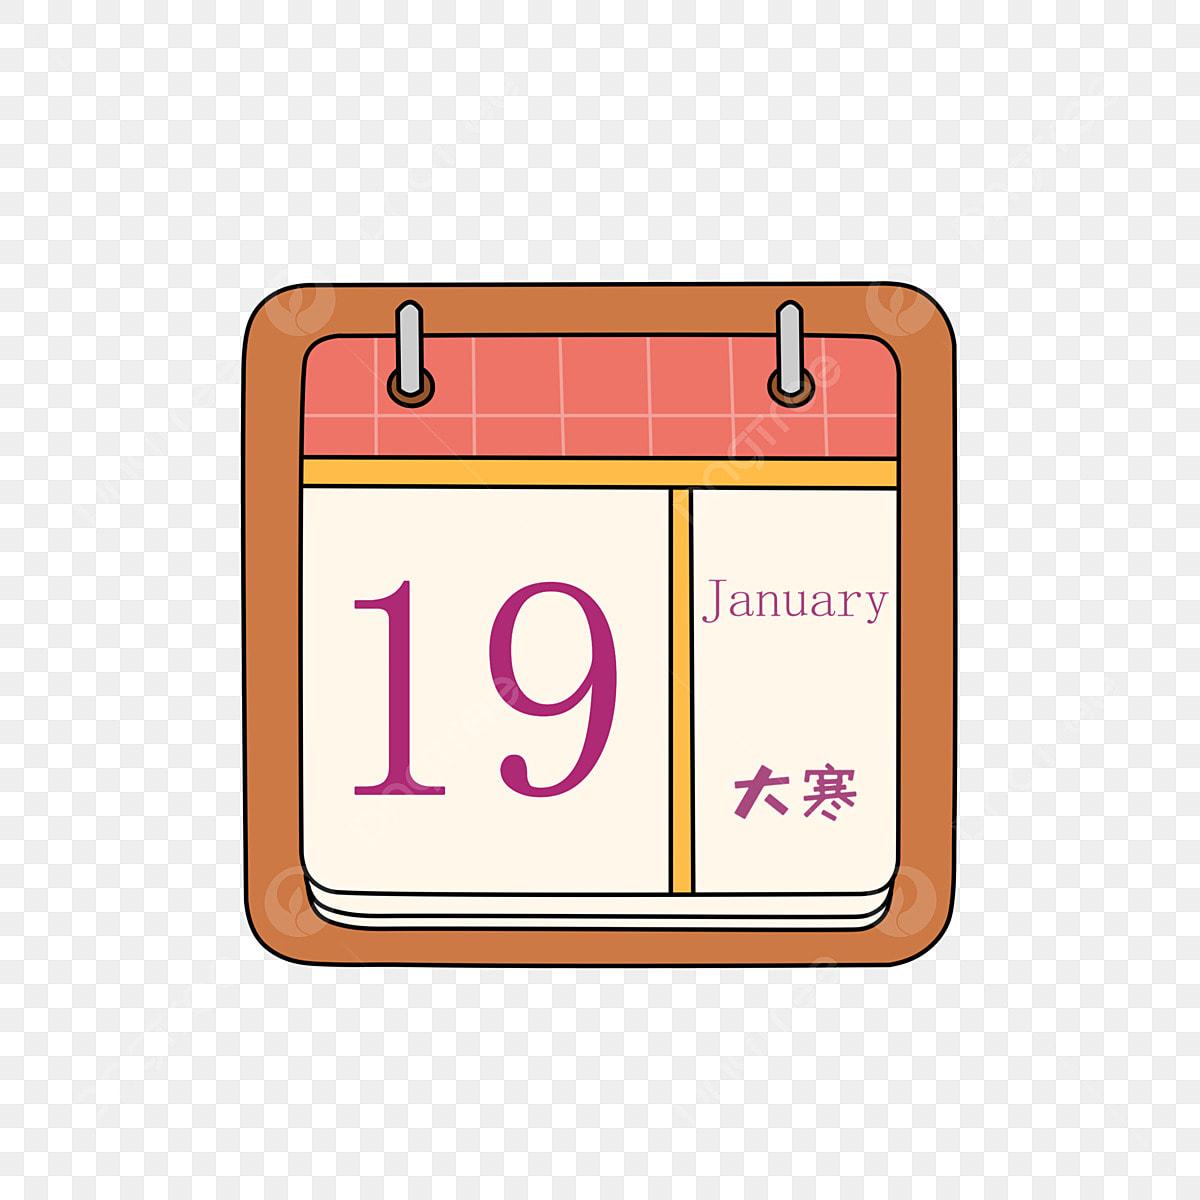 Kalender Kuning Kalendar Ditarik Tangan Kalendar Kartun